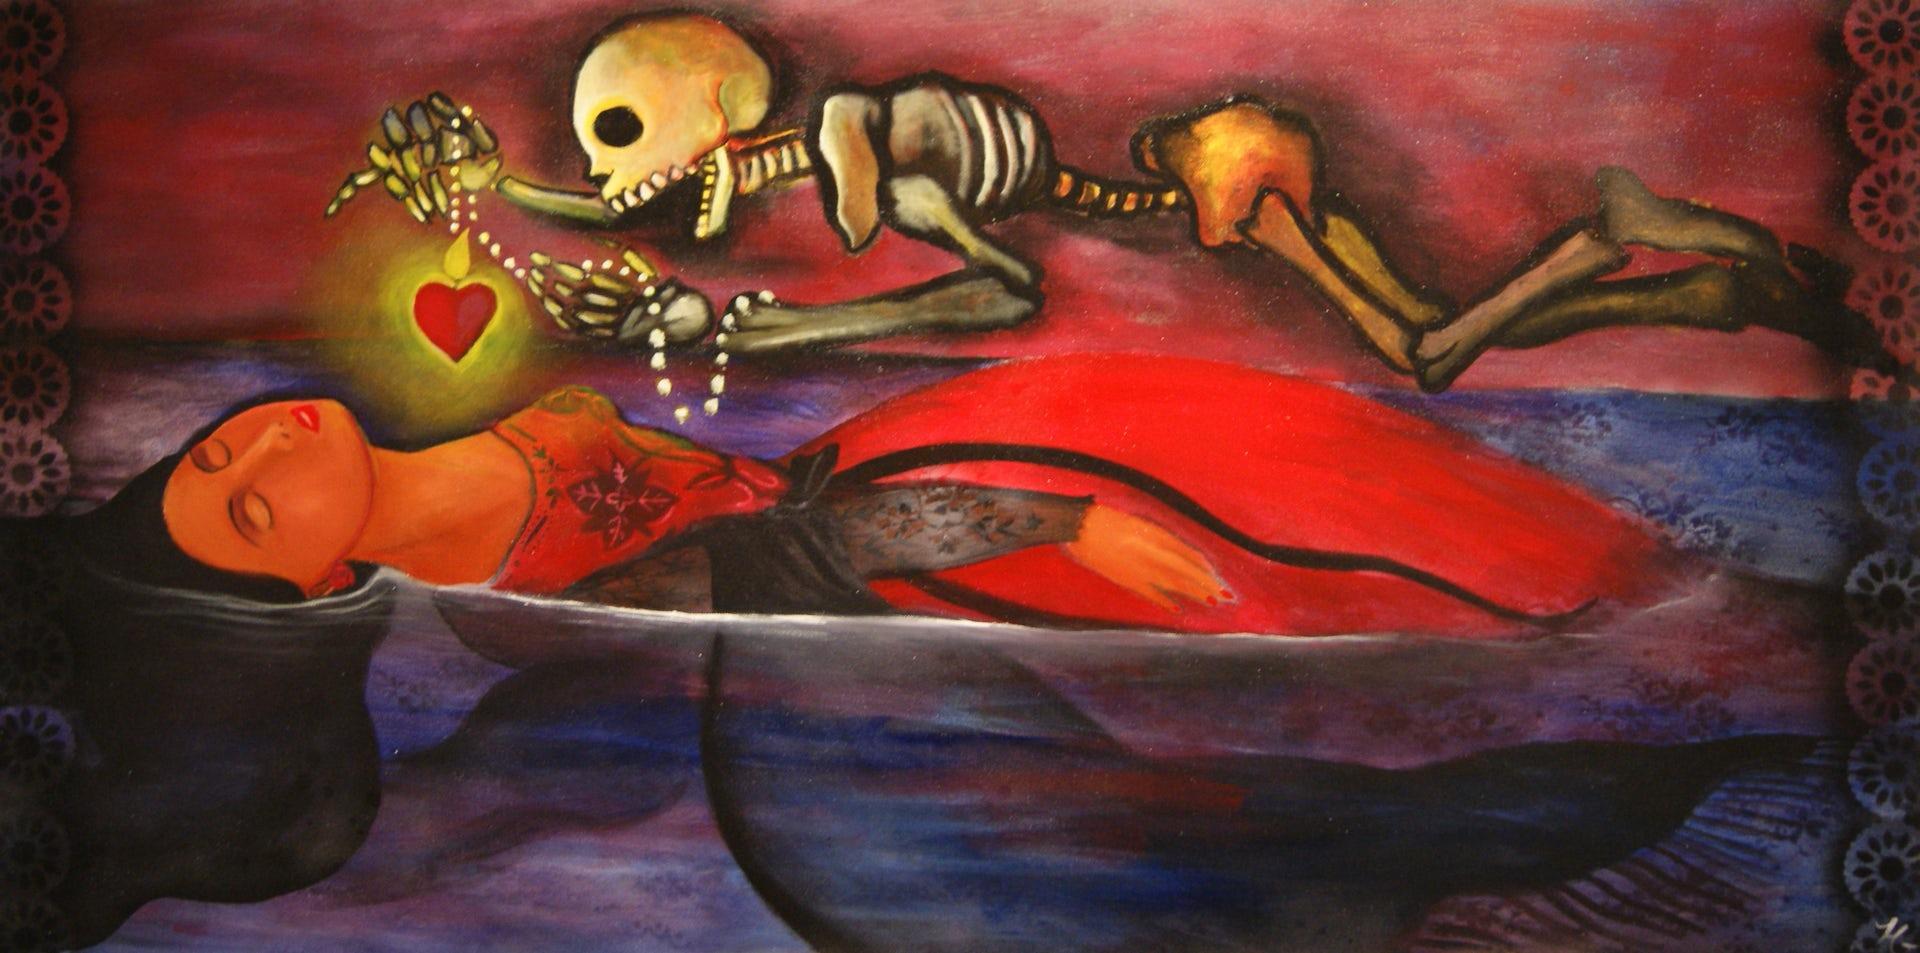 la llorona  hispanic folklore goes mainstream